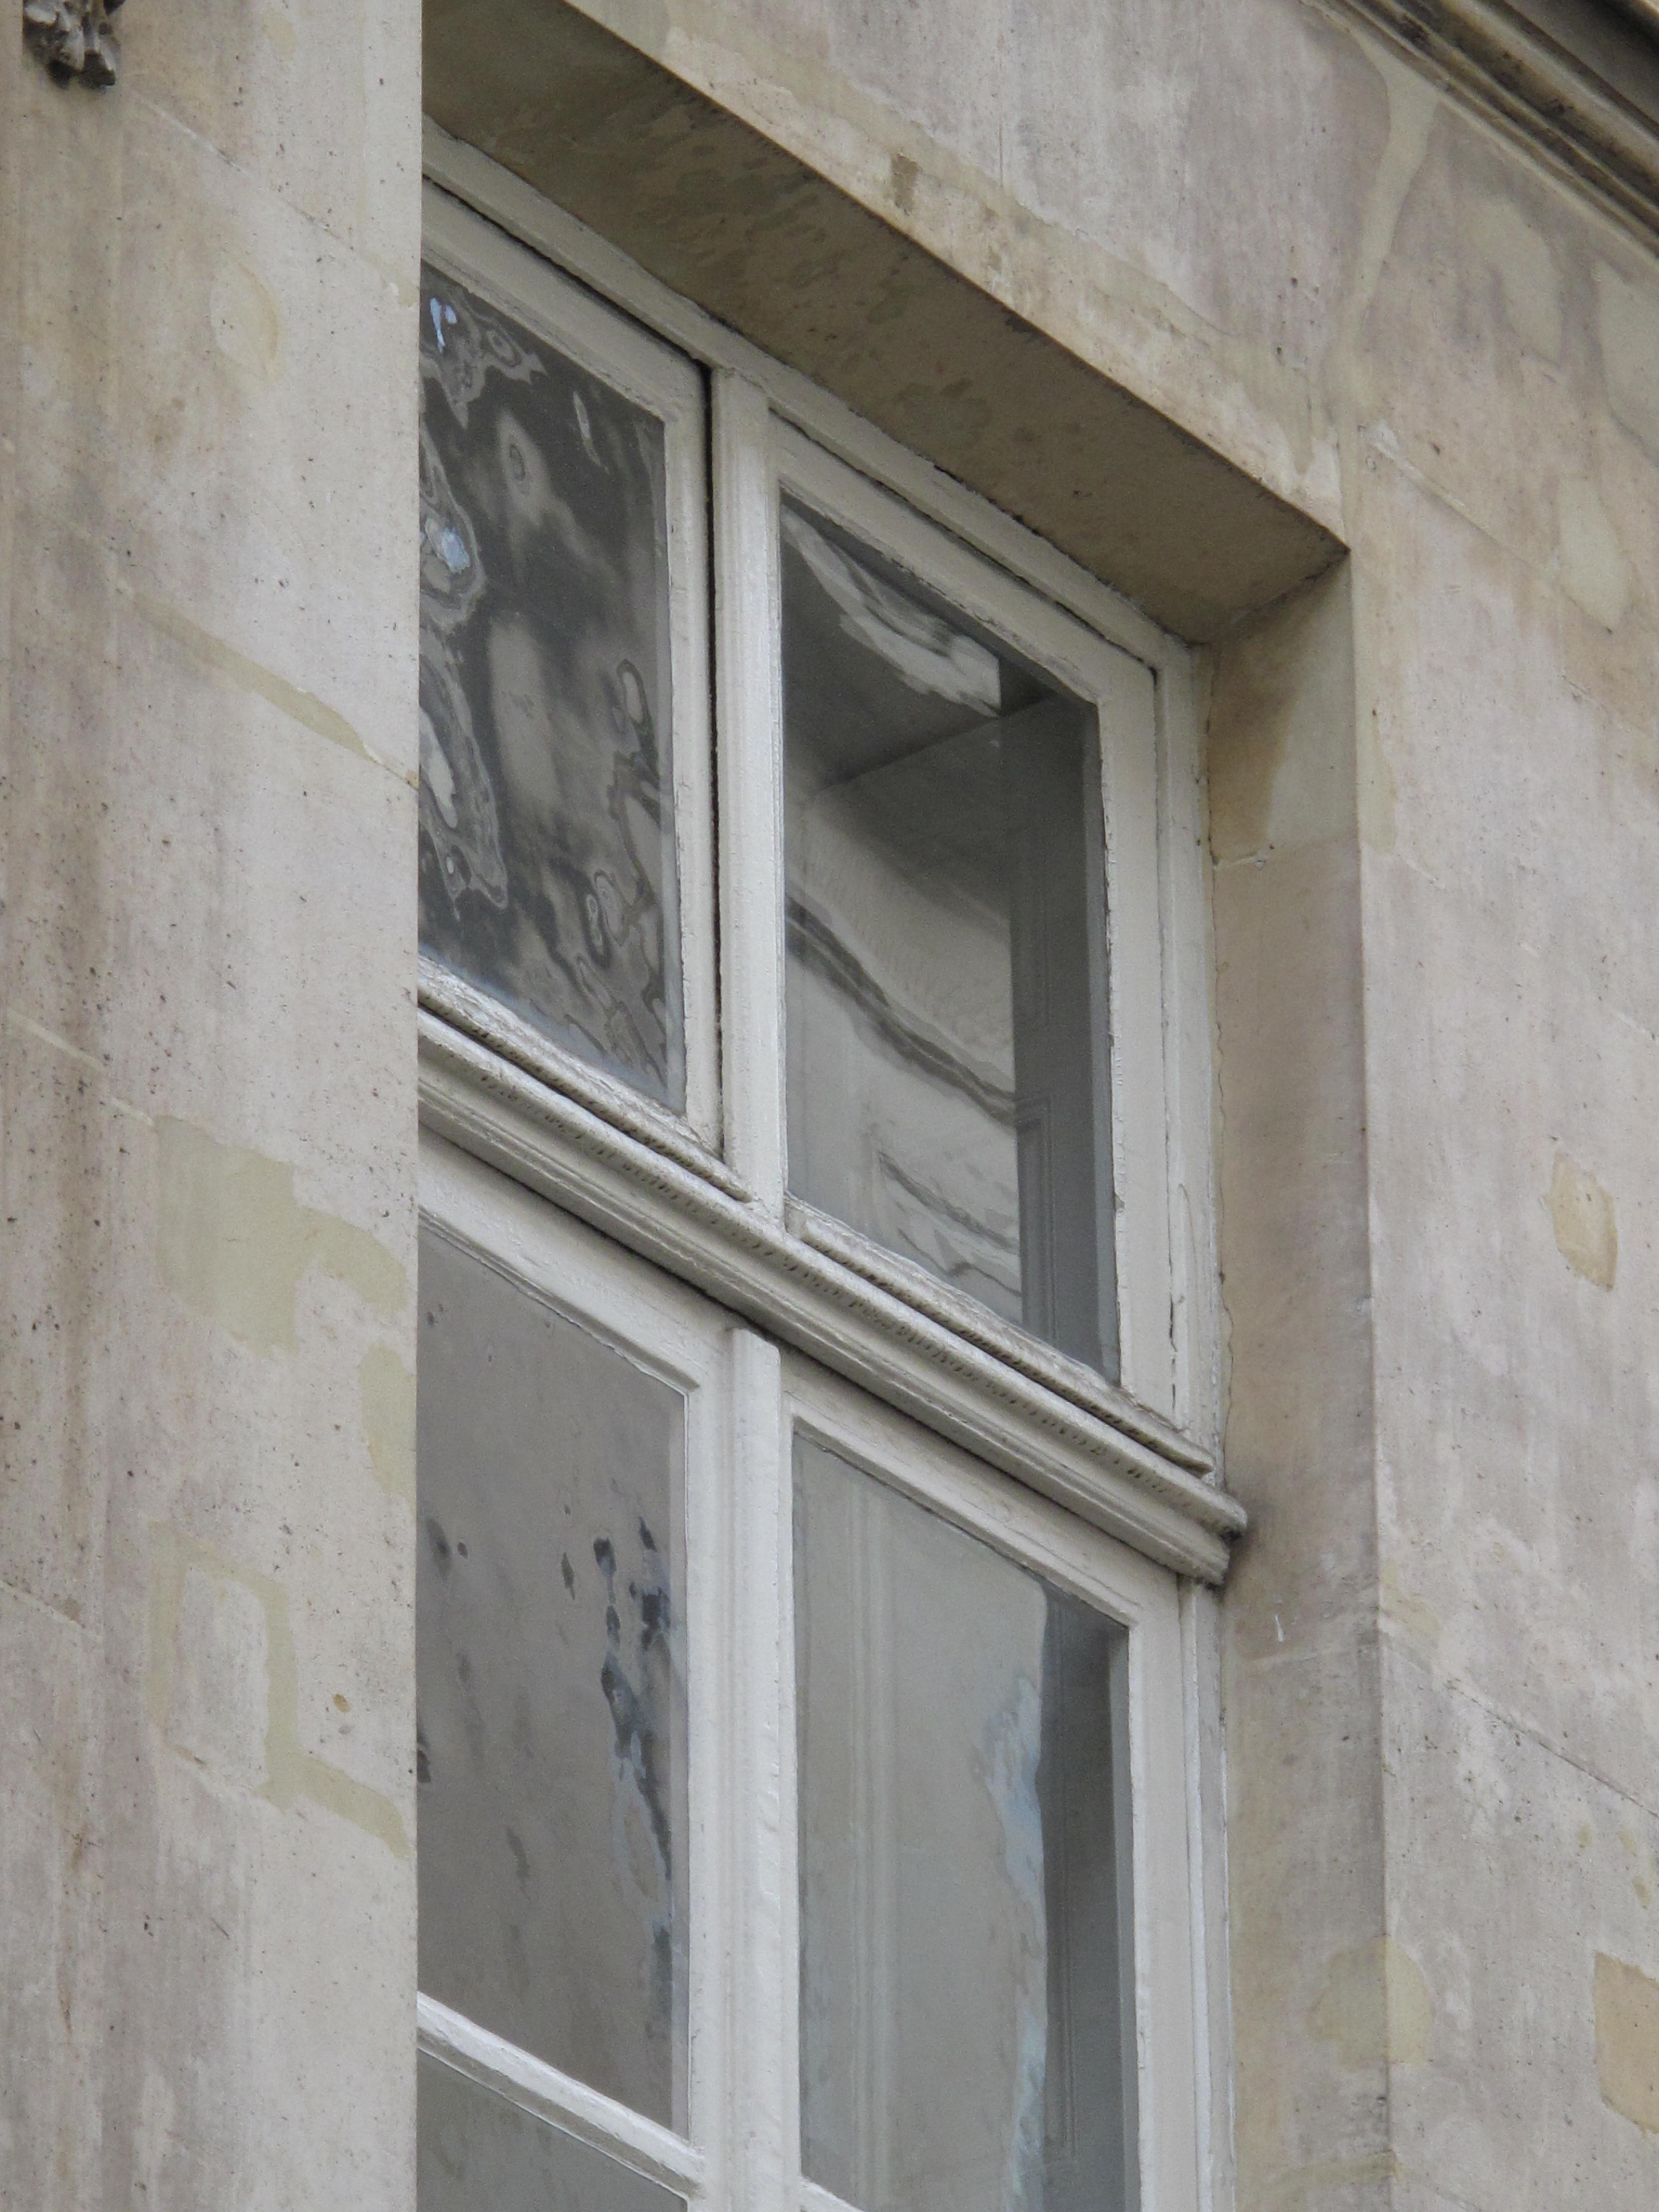 Paned Window